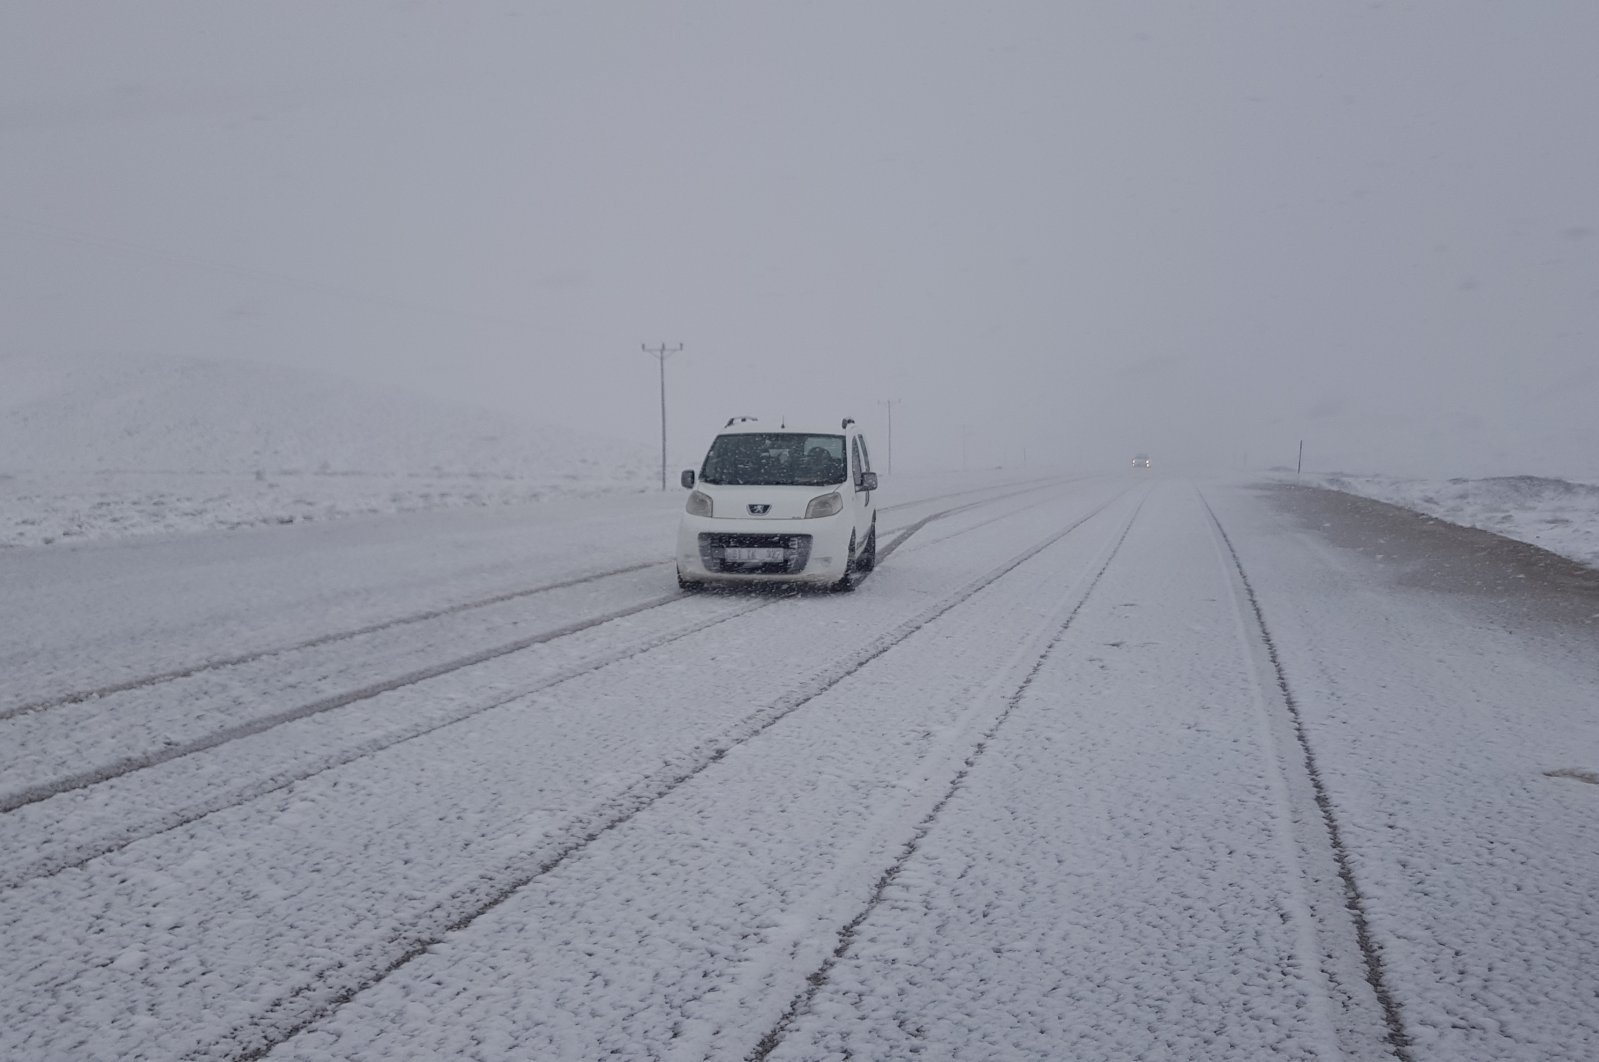 A car travels through the Ahmediye Pass on the highway between Turkey's eastern Erzincan and Gümüşhane provinces, May 25, 2020. (AA Photo)